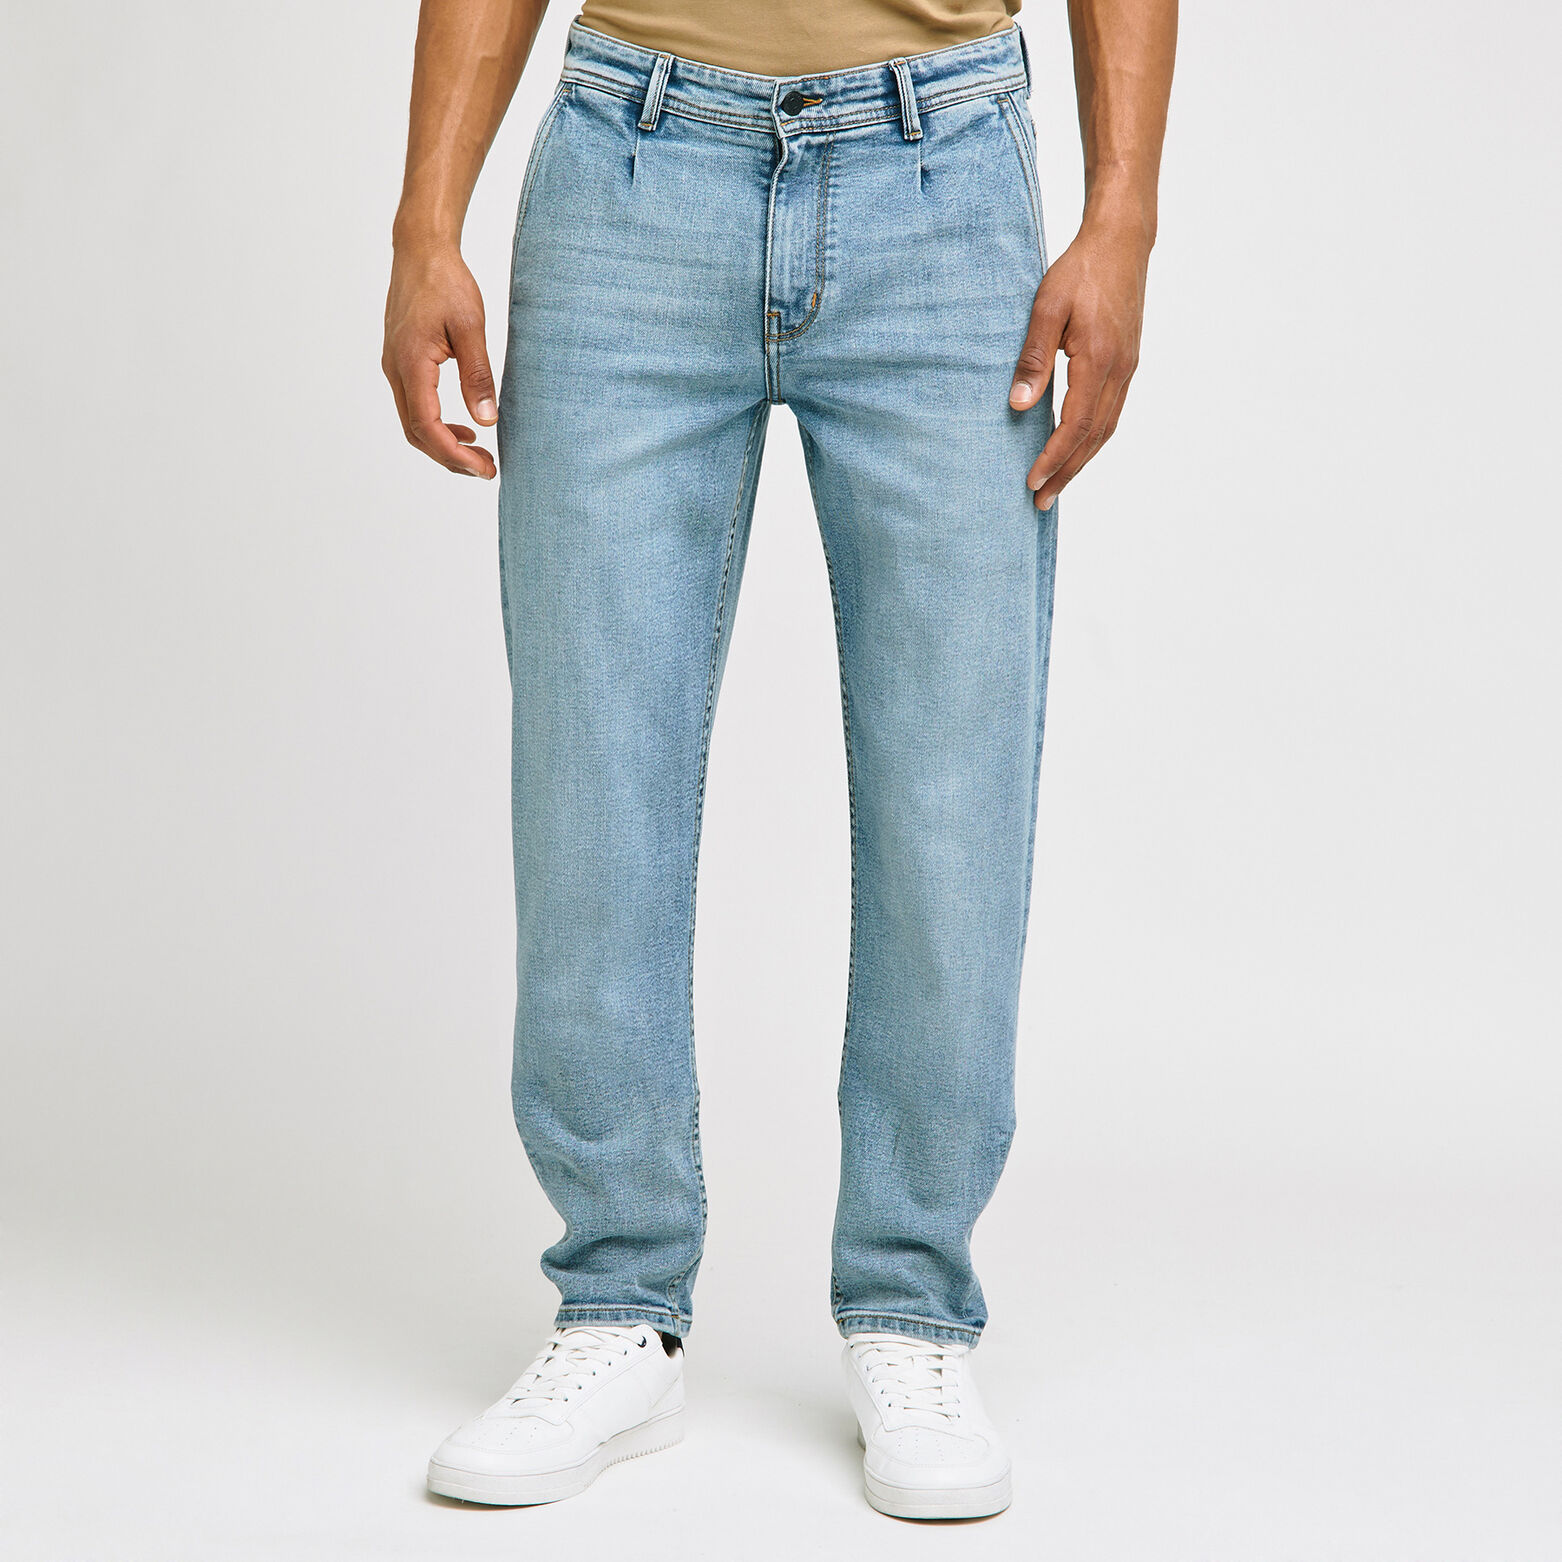 Jean confort